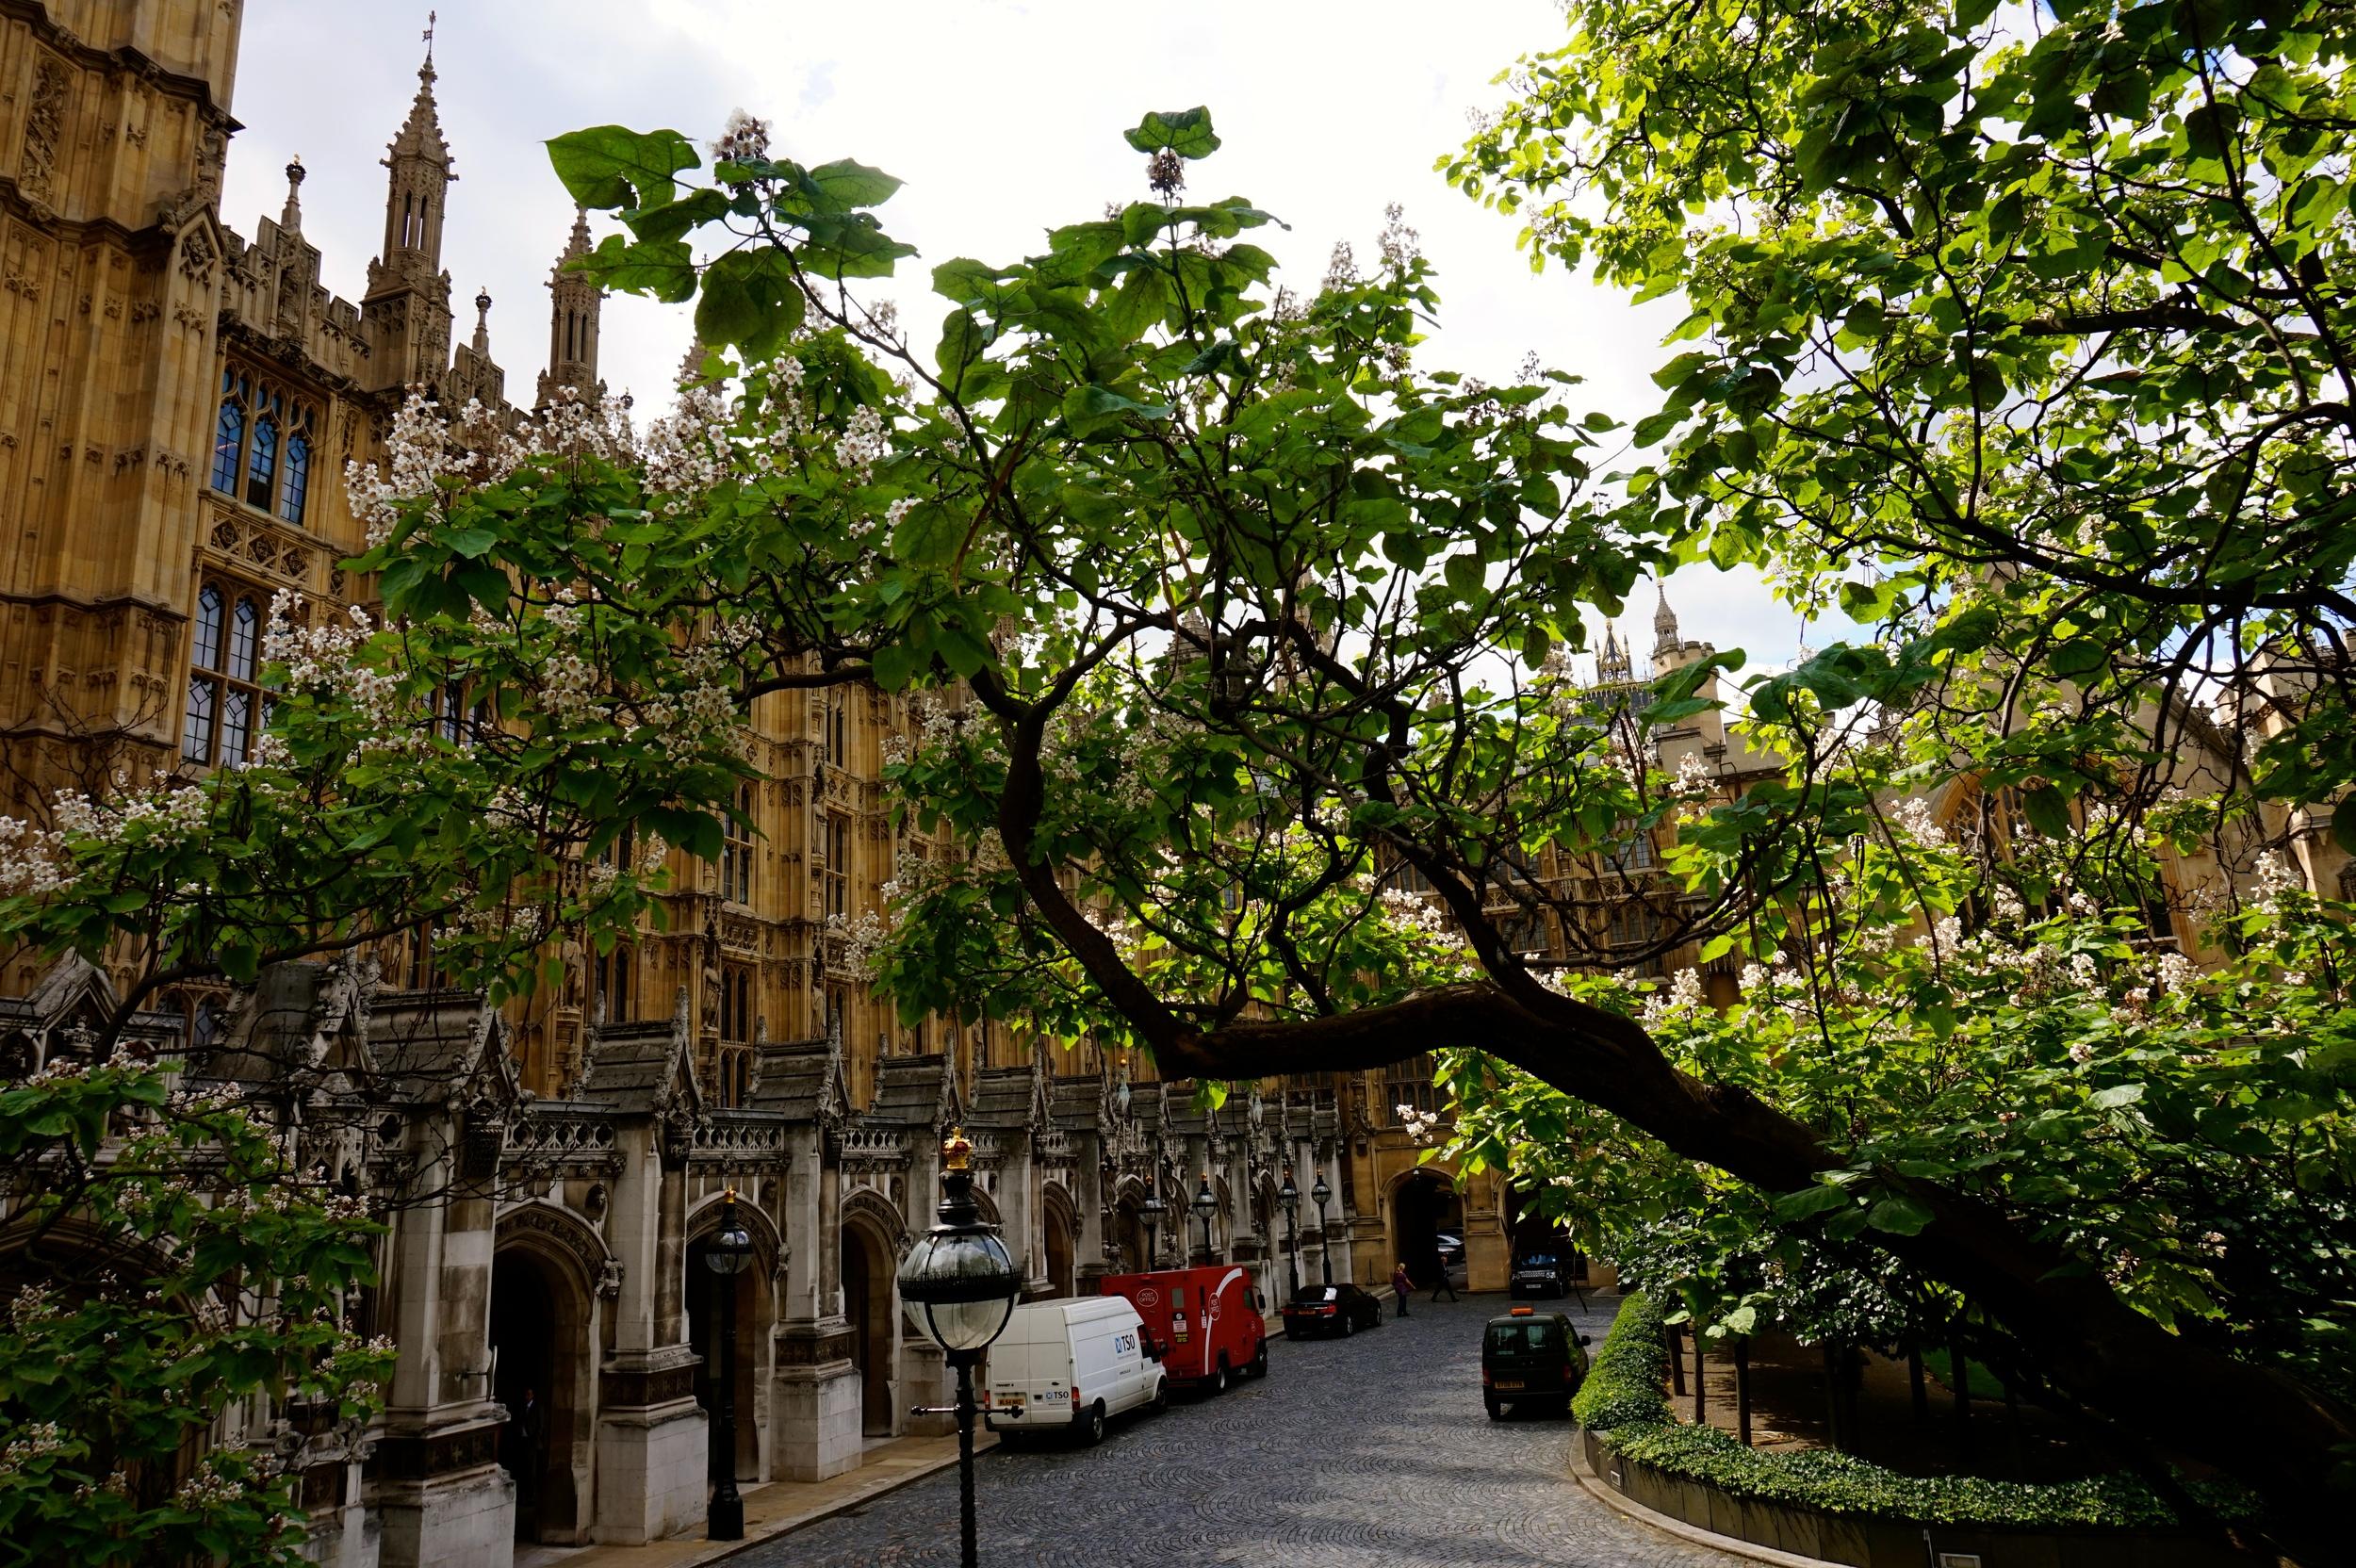 Peeking into Westminster